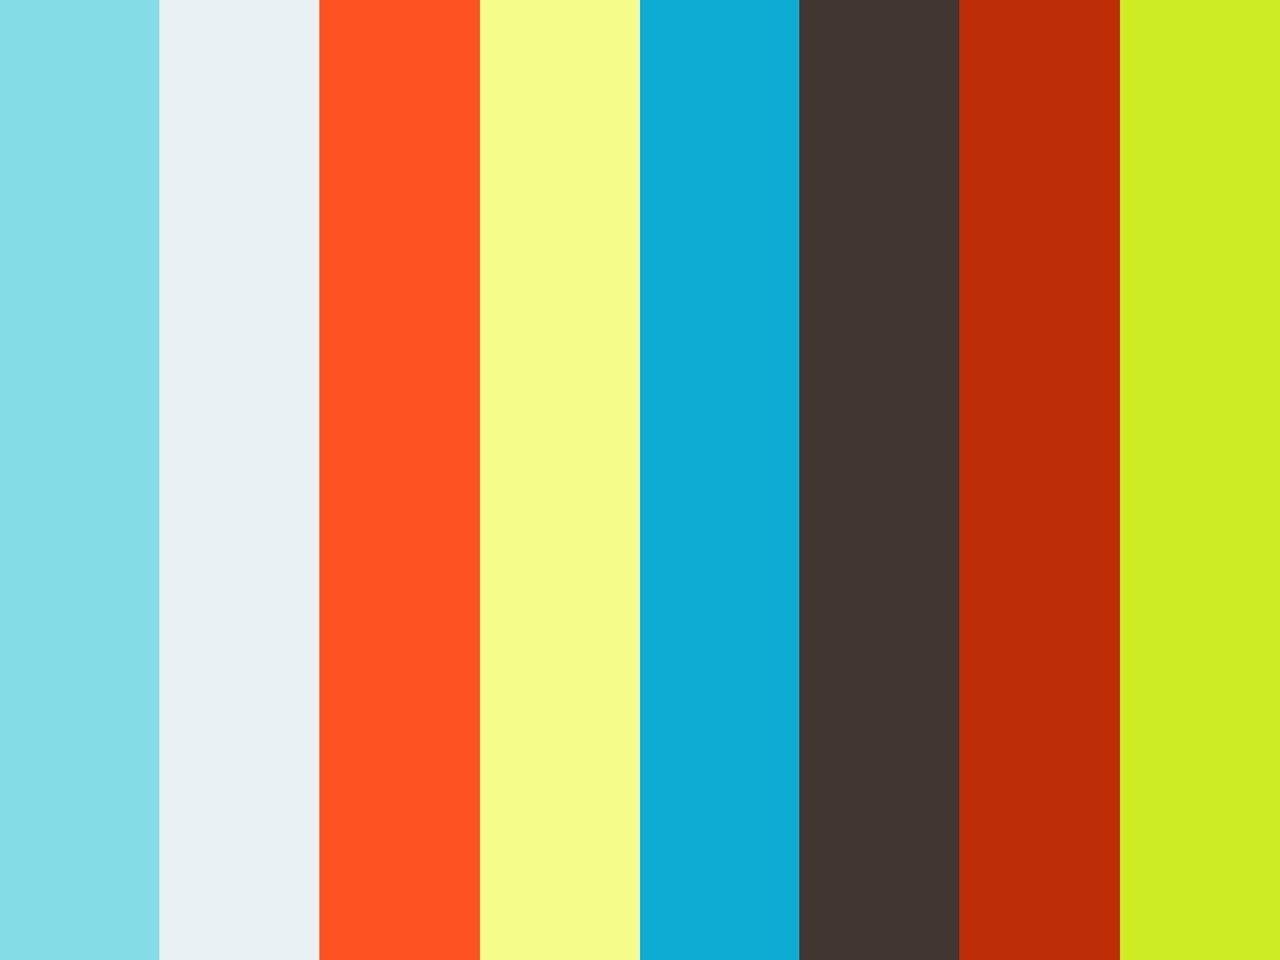 Stad Antwerpen - Tewerkstellingsprogramma IACTA